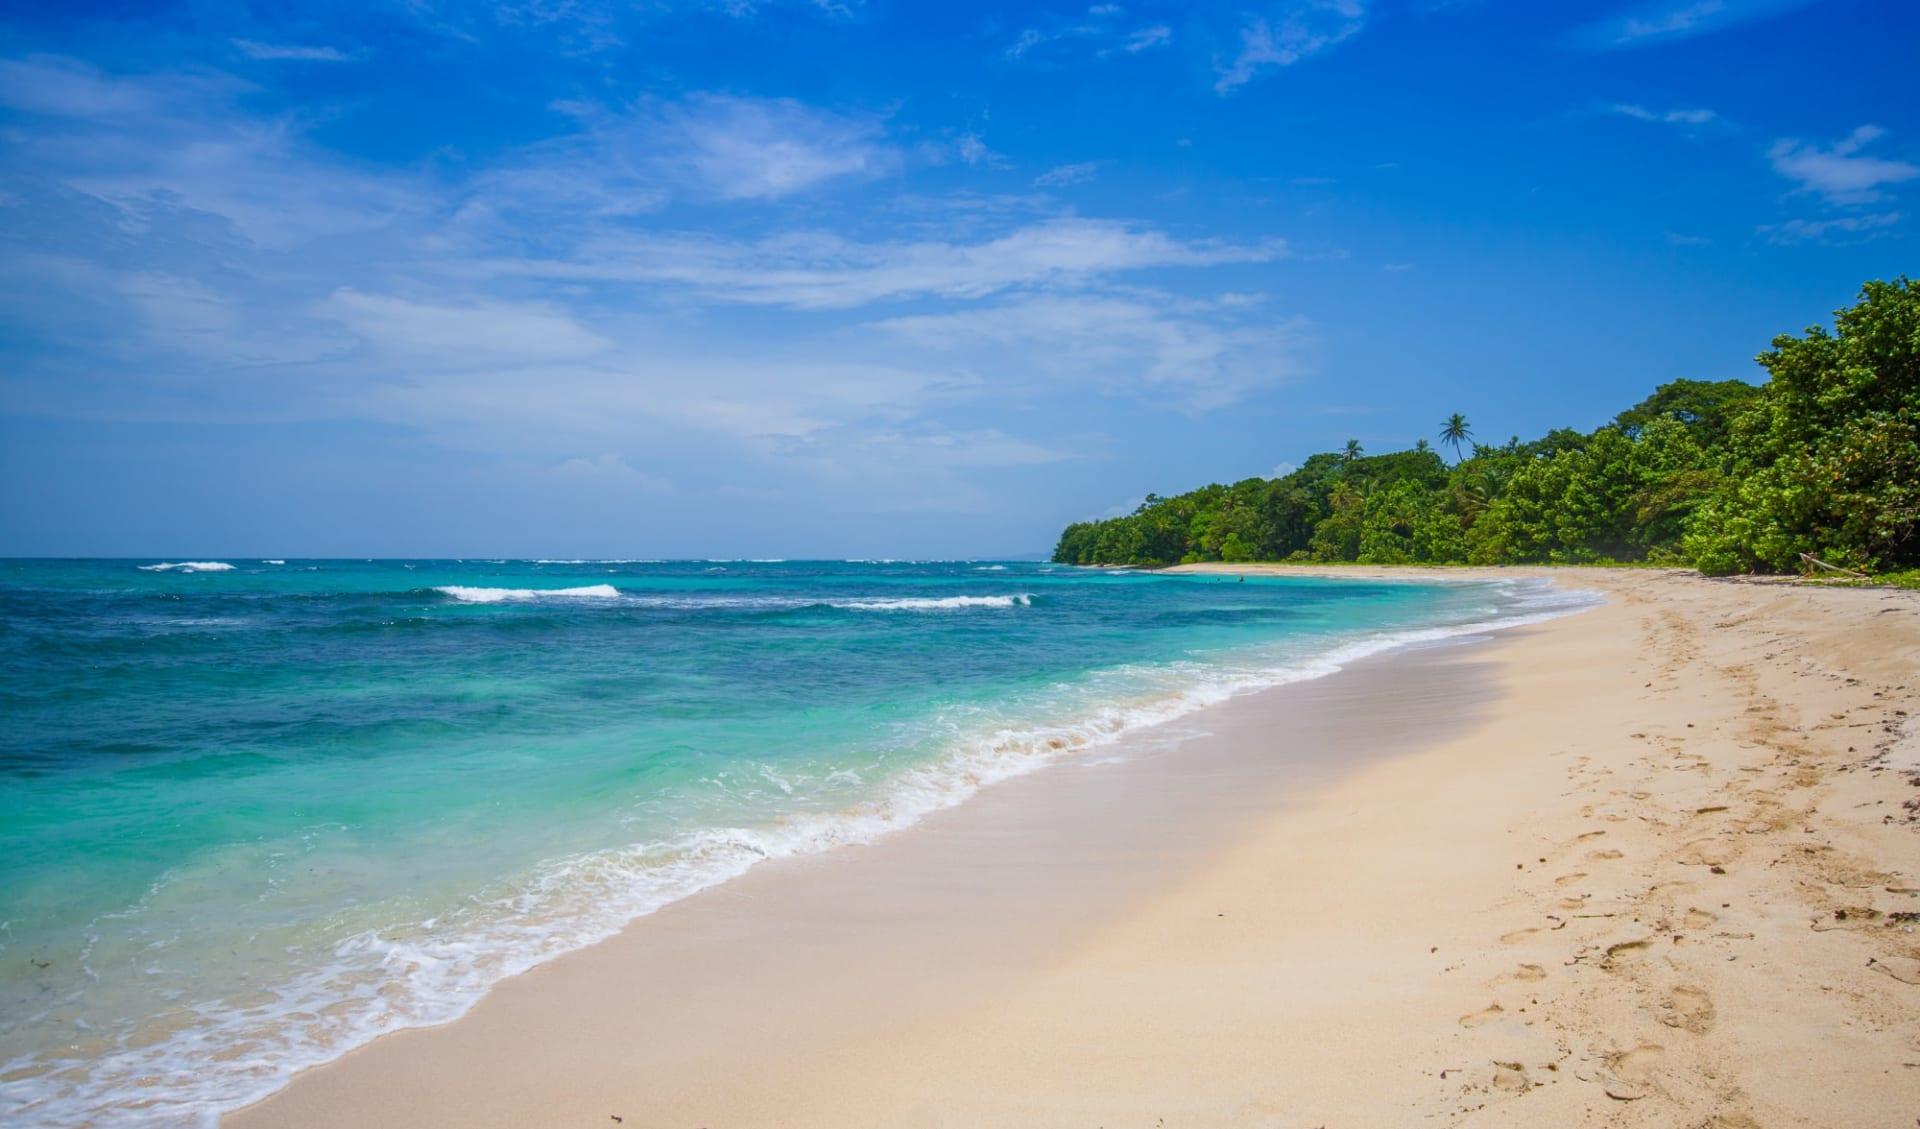 Privatreise Das Beste von Panama ab Panama City: Panama - Bocas del Toro -  Isla Zapatille Strand